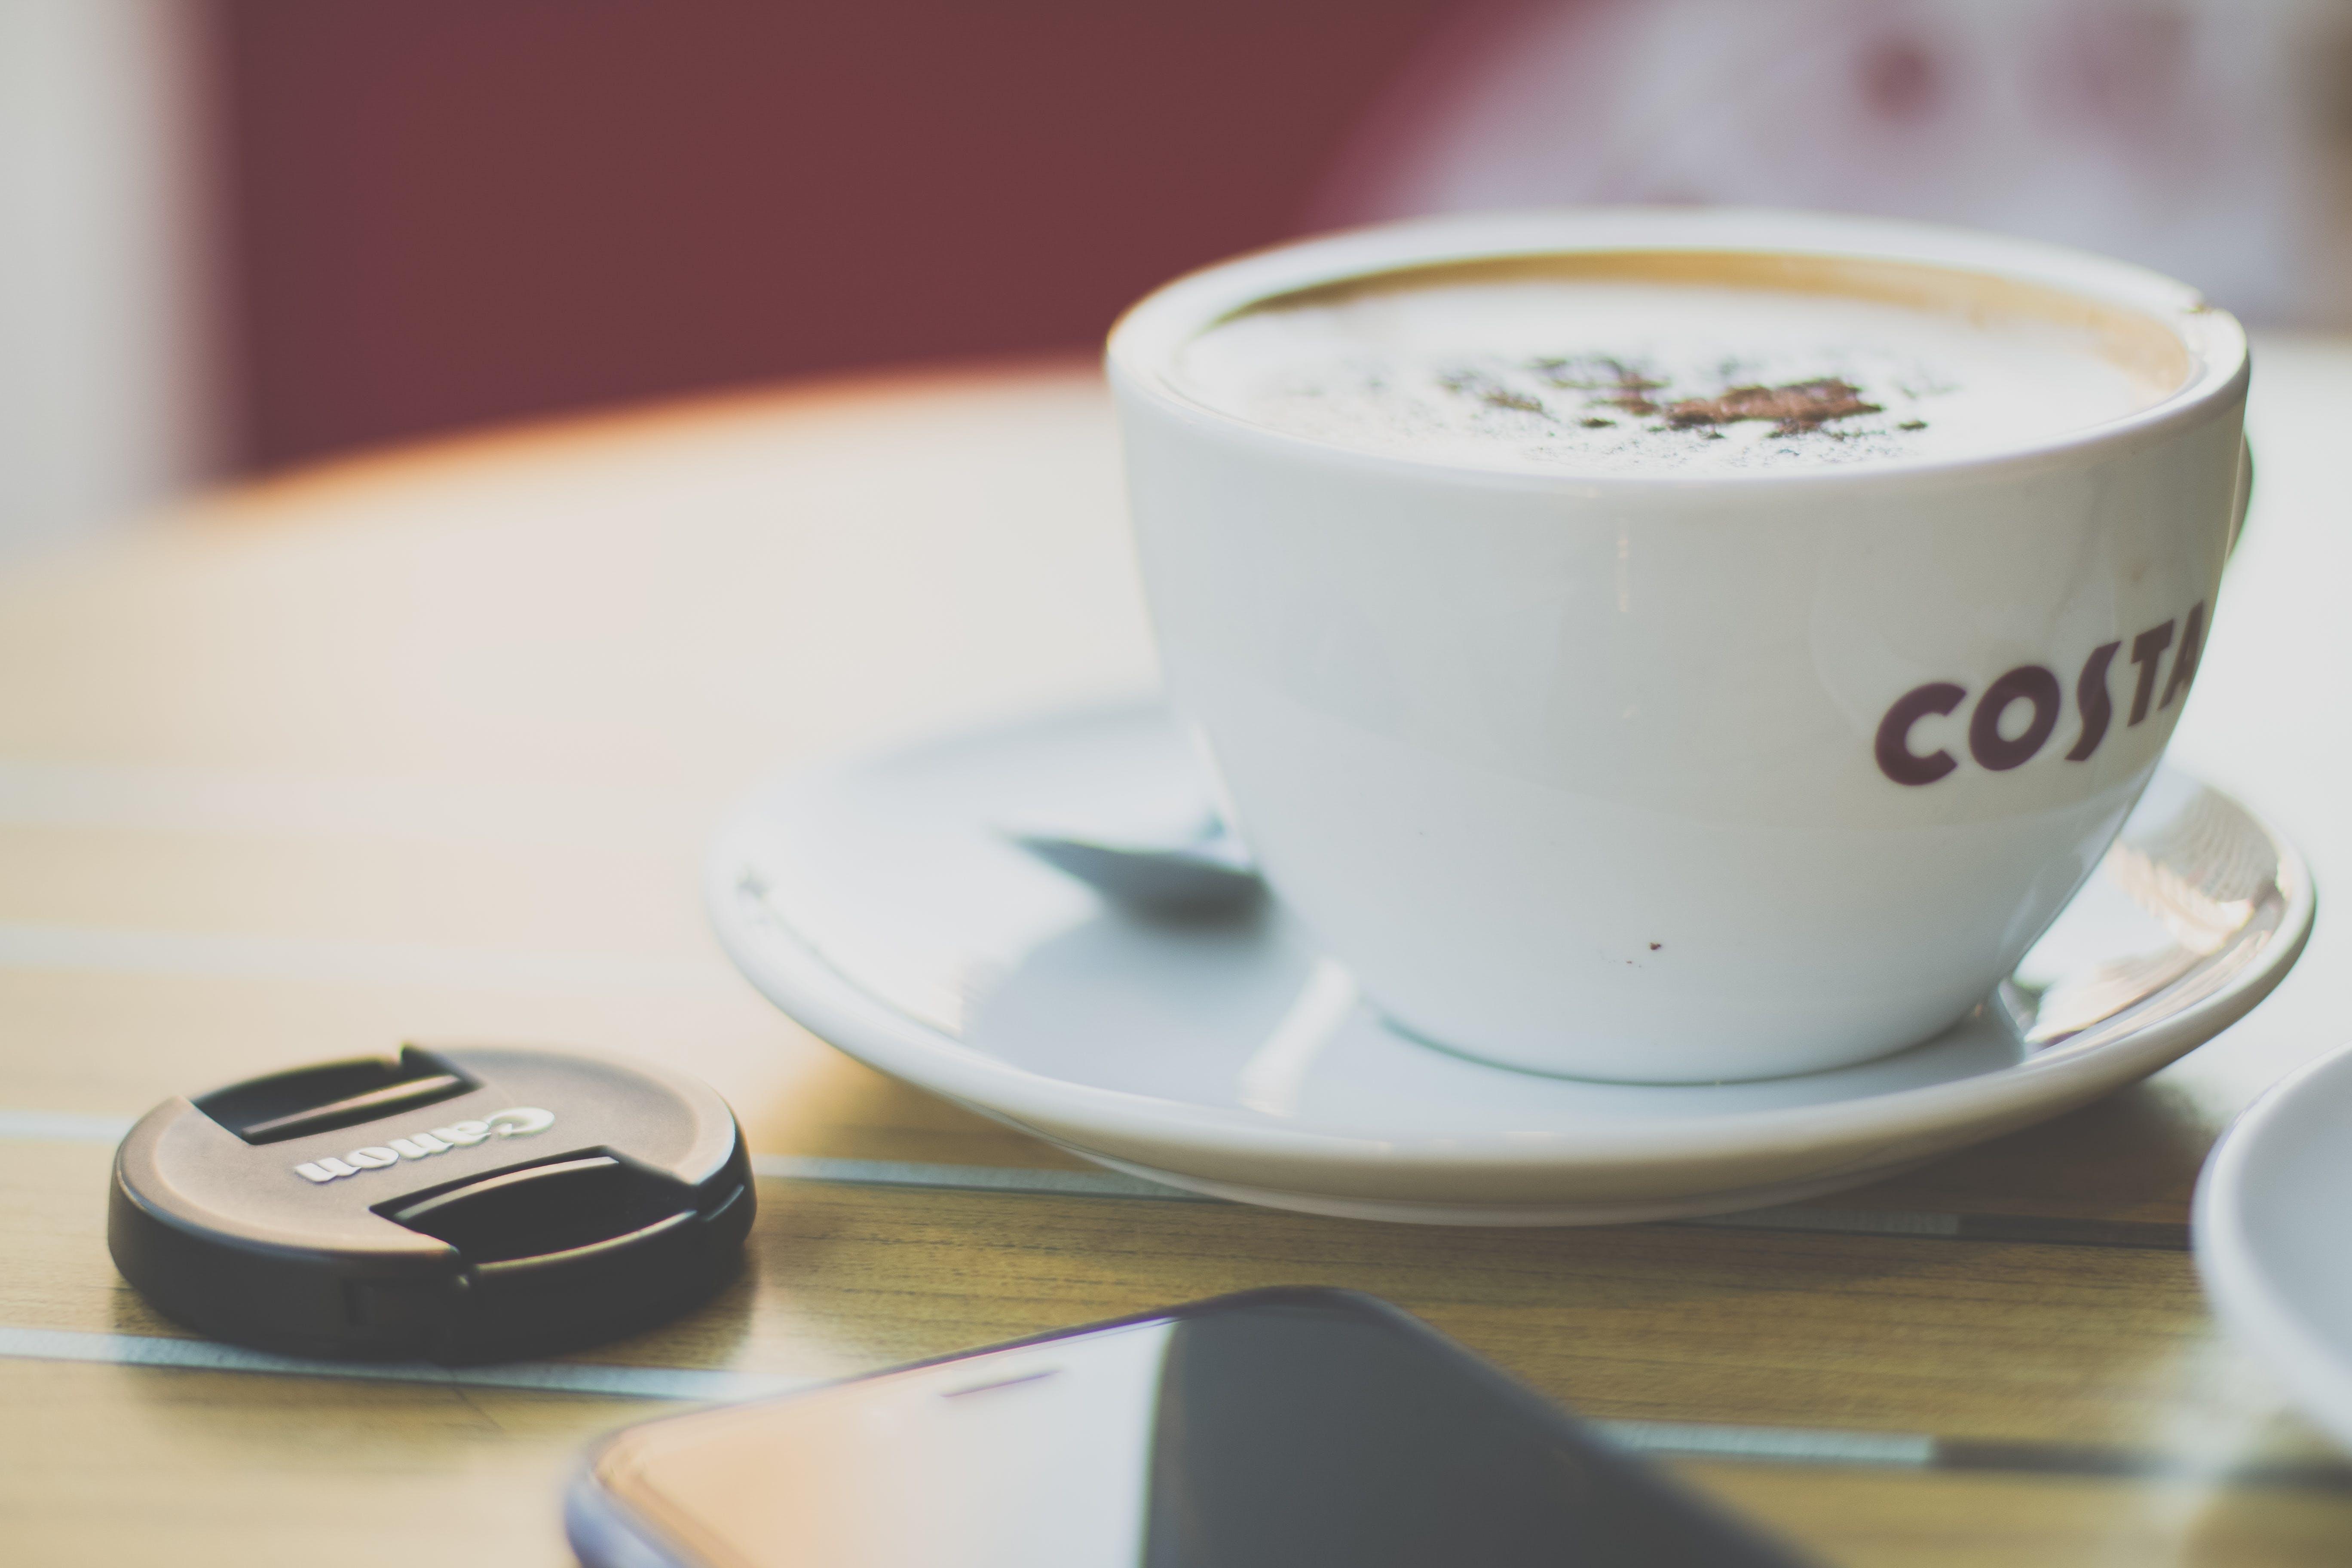 White Ceramic Cup Beside Black Smartphone